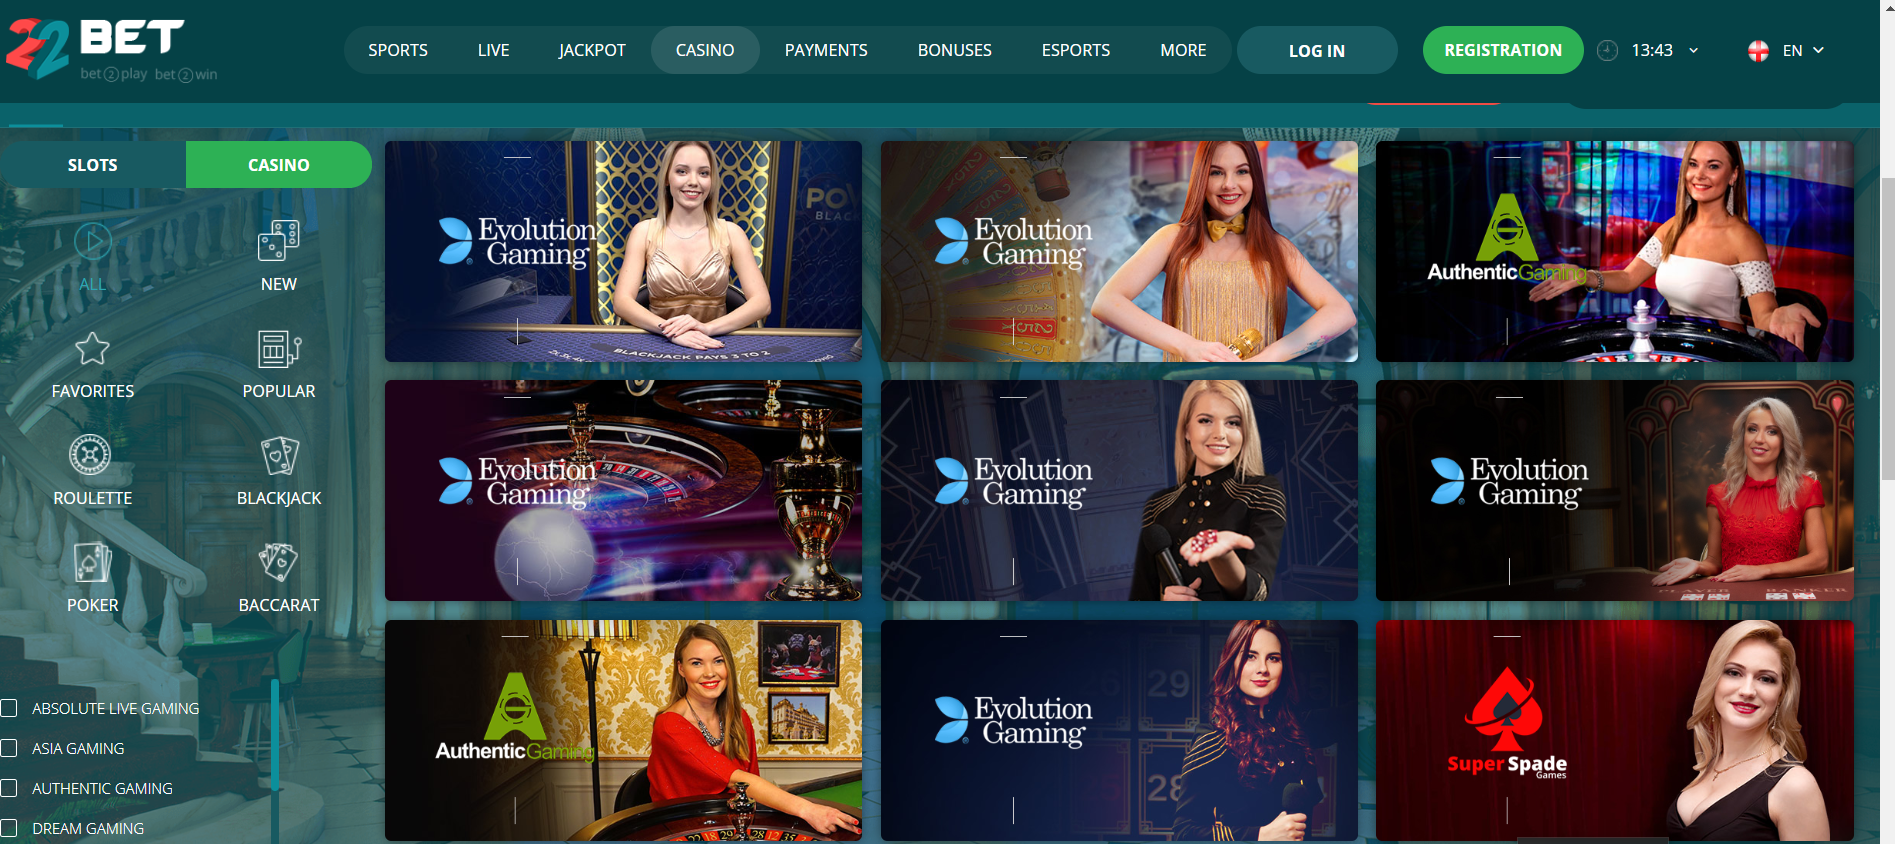 Casinos foxium Espanha freebet 30382